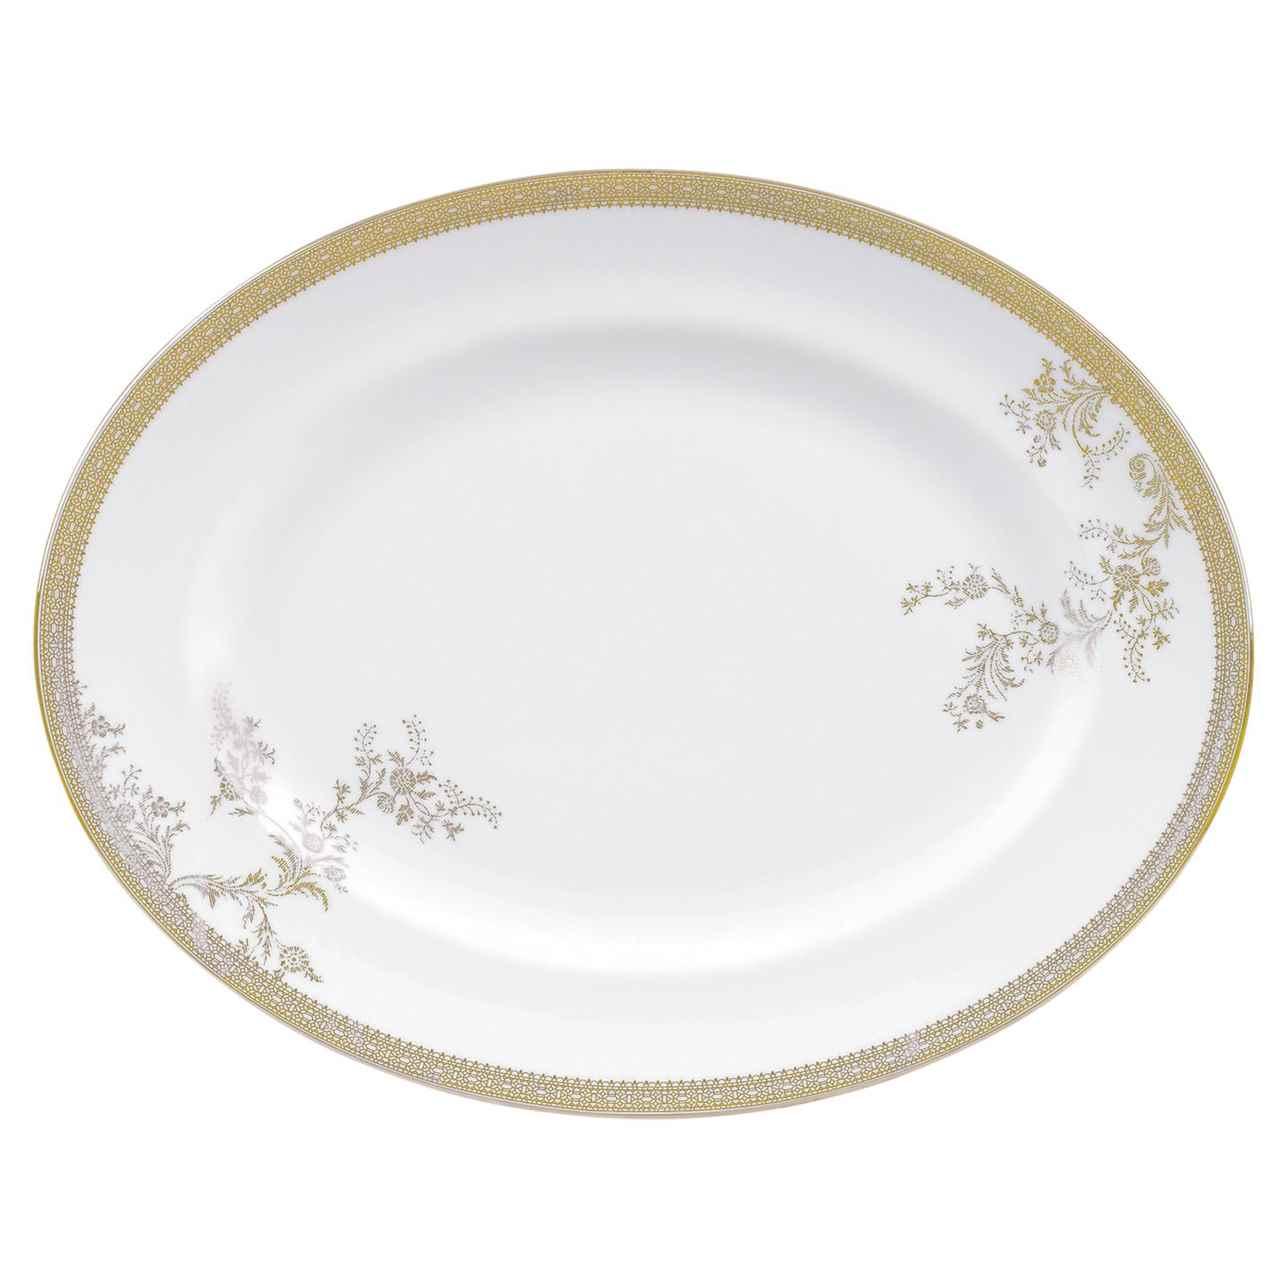 Vera Wang Lace Gold Oval Dish 35cm